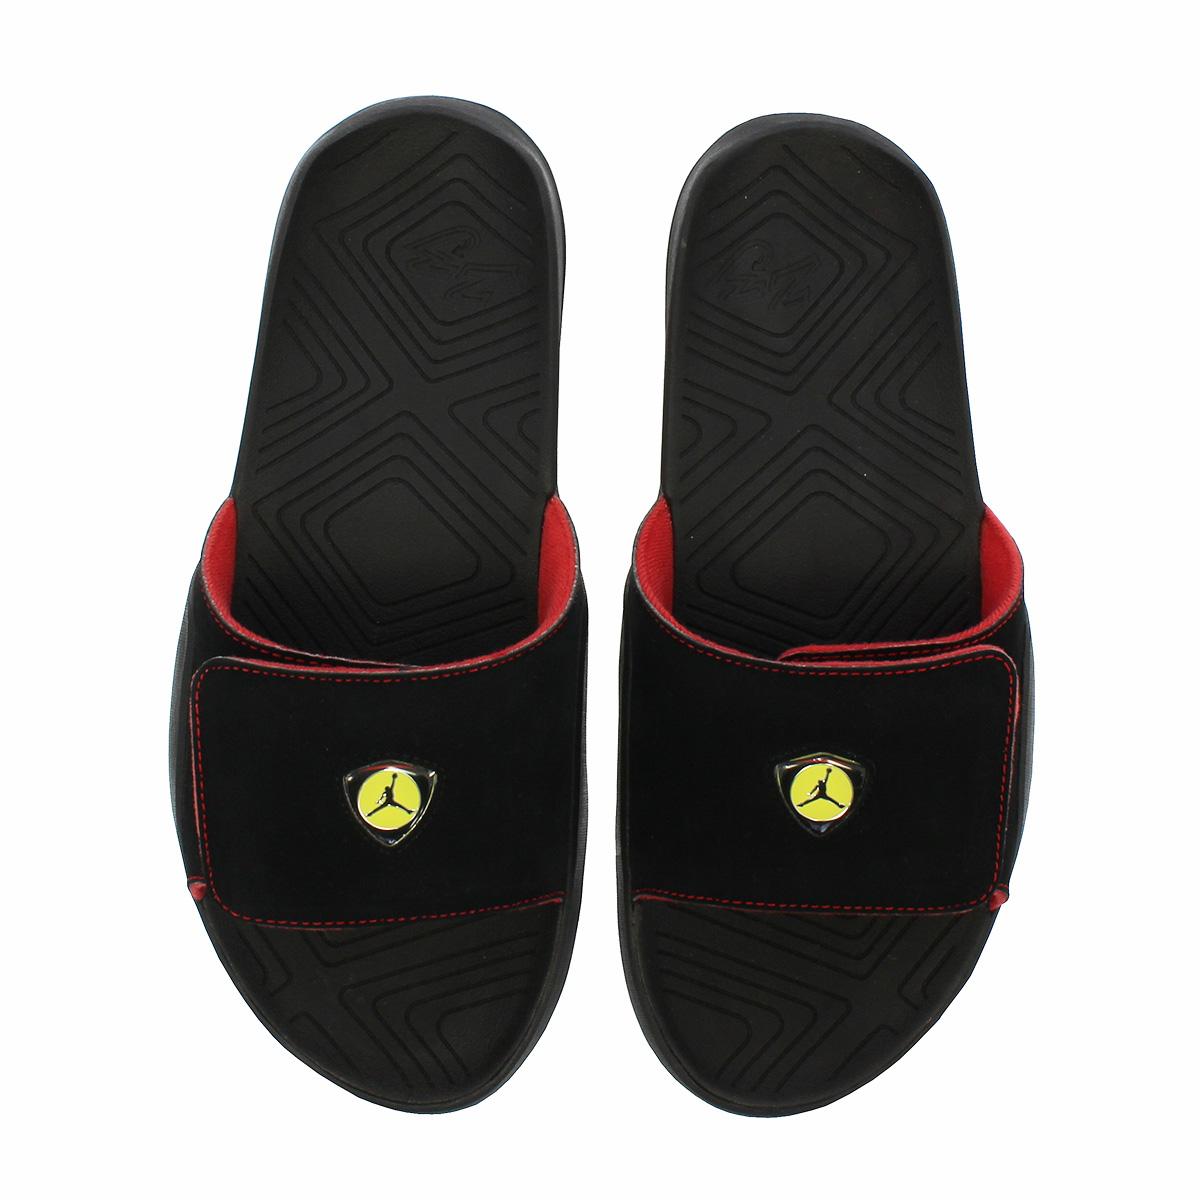 7f4454879abe LOWTEX PLUS  NIKE JORDAN HYDRO 7 Nike Jordan high mud 7 BLACK BLACK ...